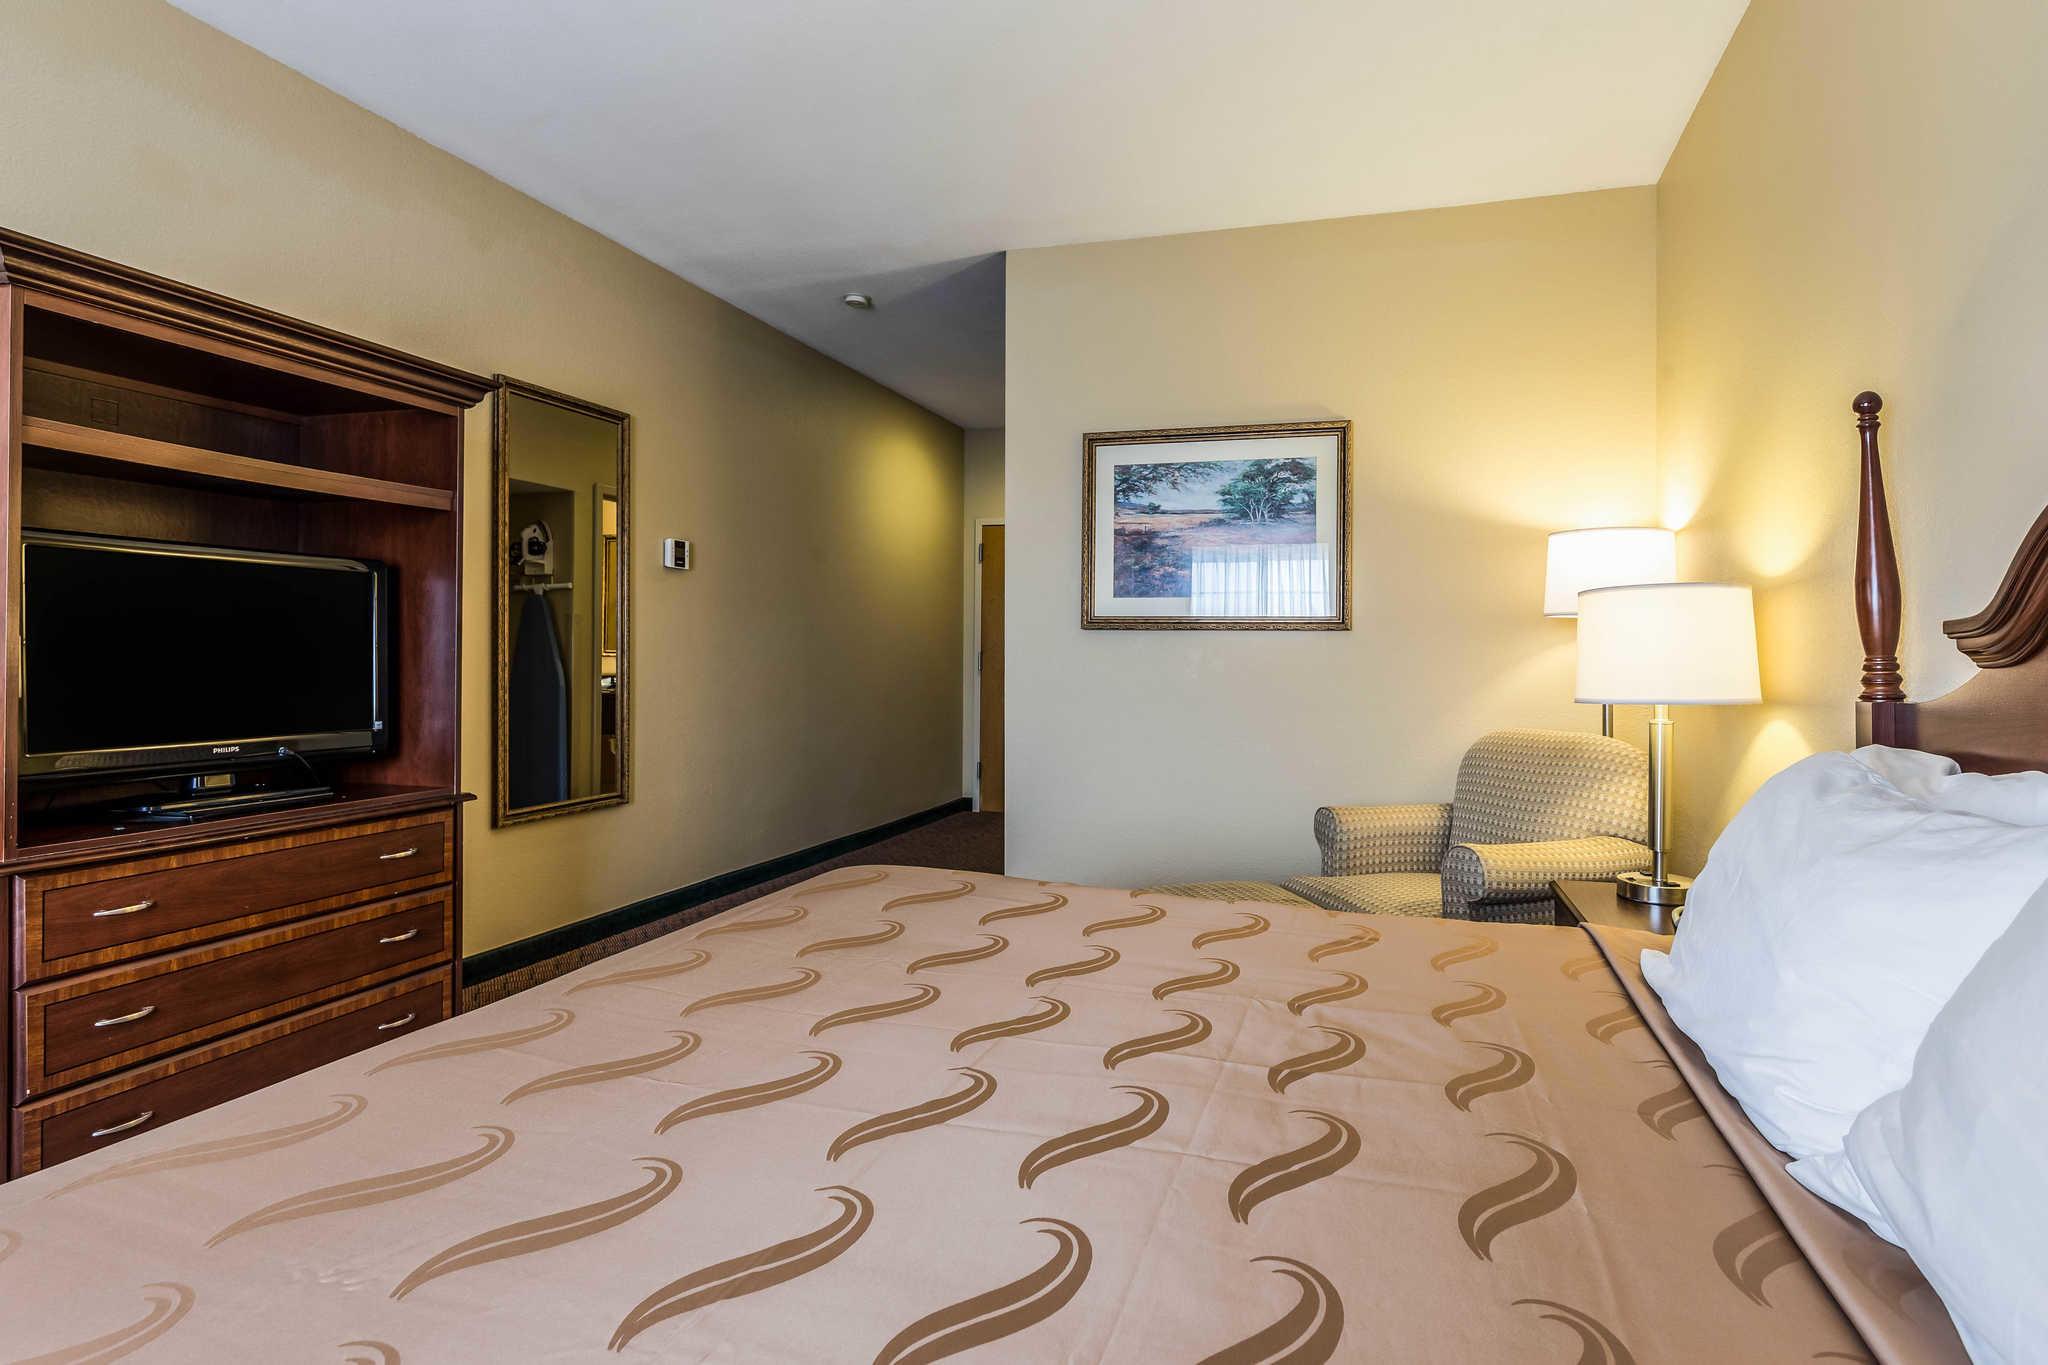 Quality Inn & Suites image 11